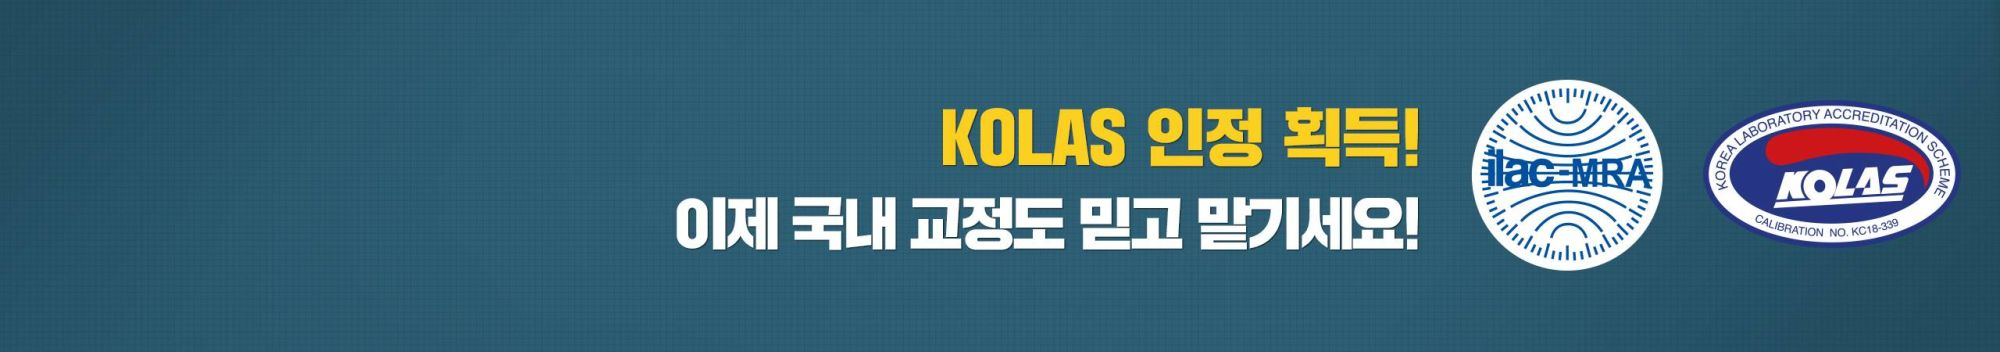 KOLAS 인정 획득 기념 프로모션